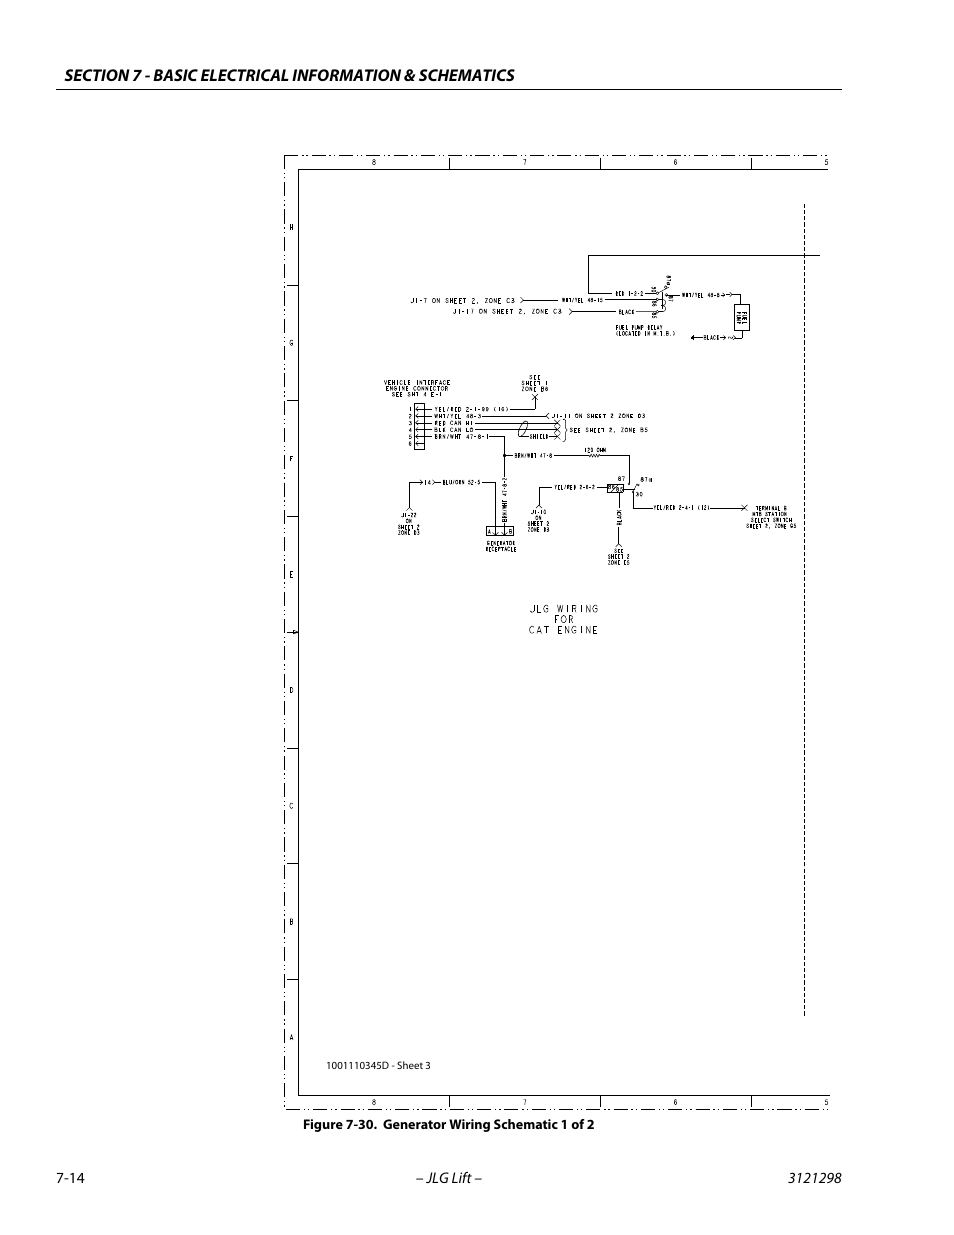 medium resolution of generator wiring schematic 1 of 2 14 jlg 660sj service manual user manual